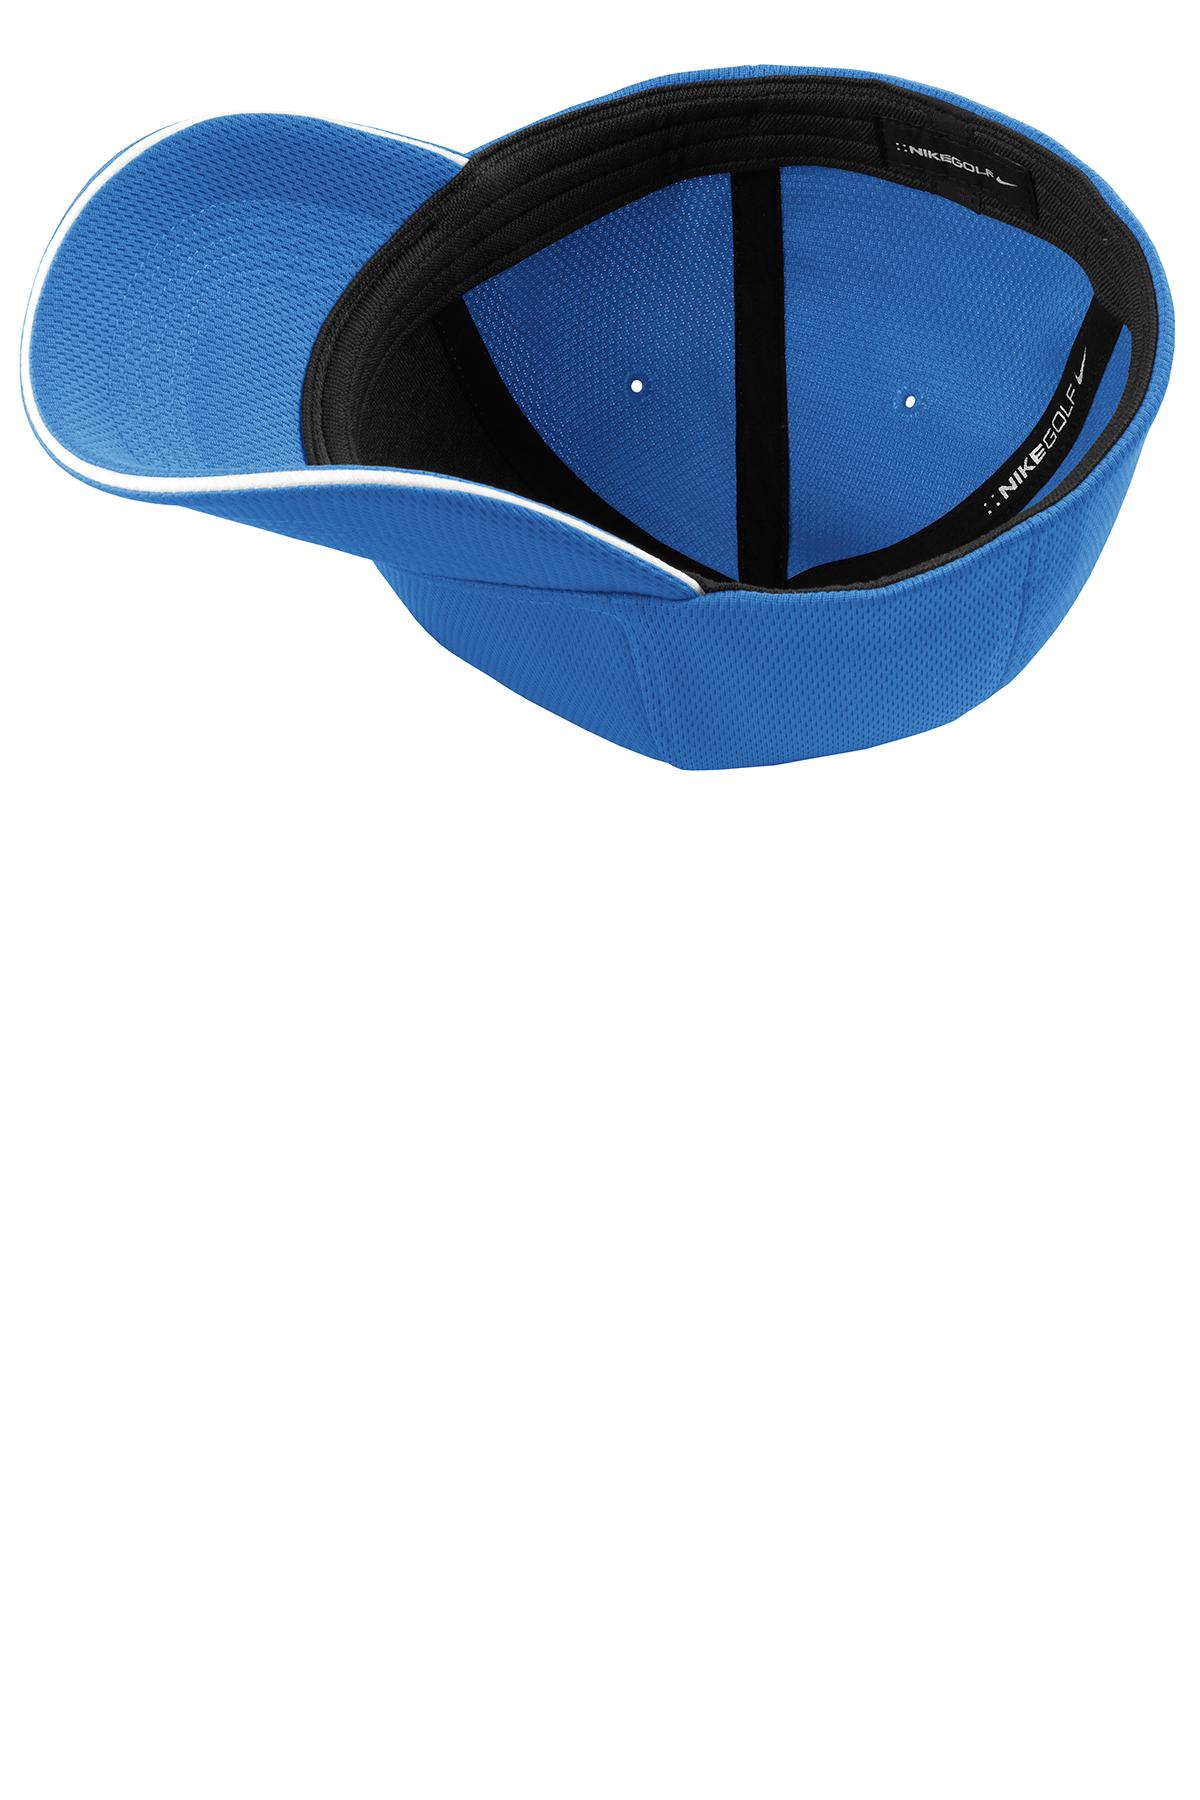 dbd8e014f1d689 Nike Dri-FIT Mesh Swoosh Flex Sandwich Cap | Performance/Team | Caps ...